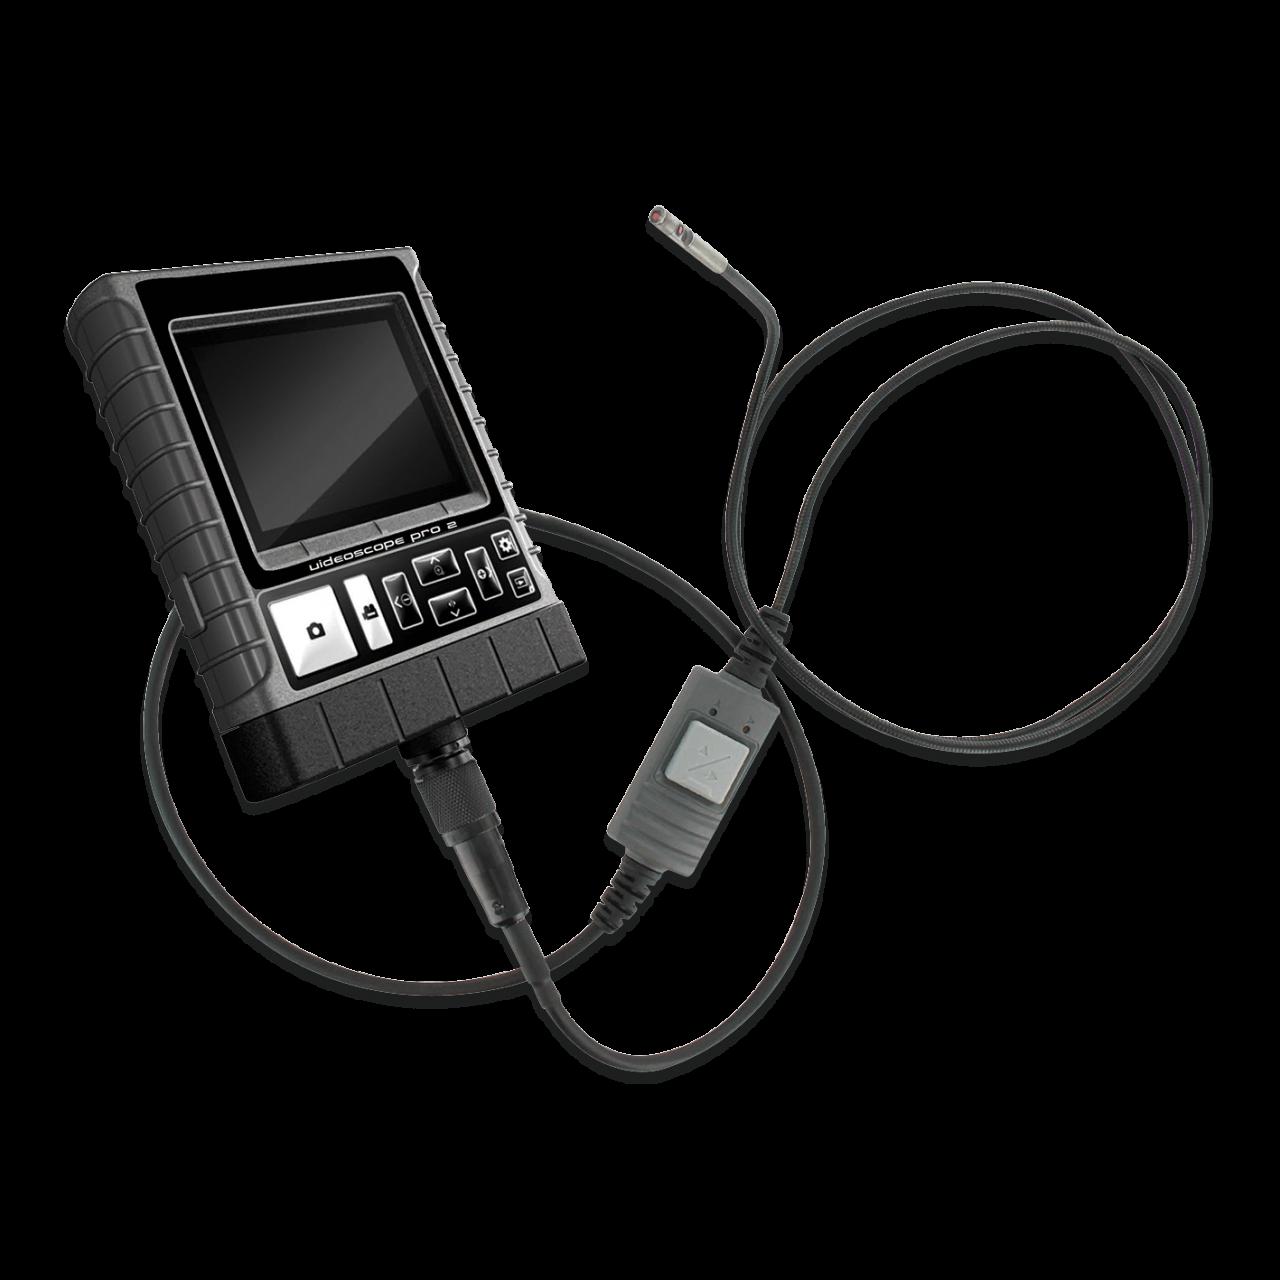 Video-Endoskop Bild 1